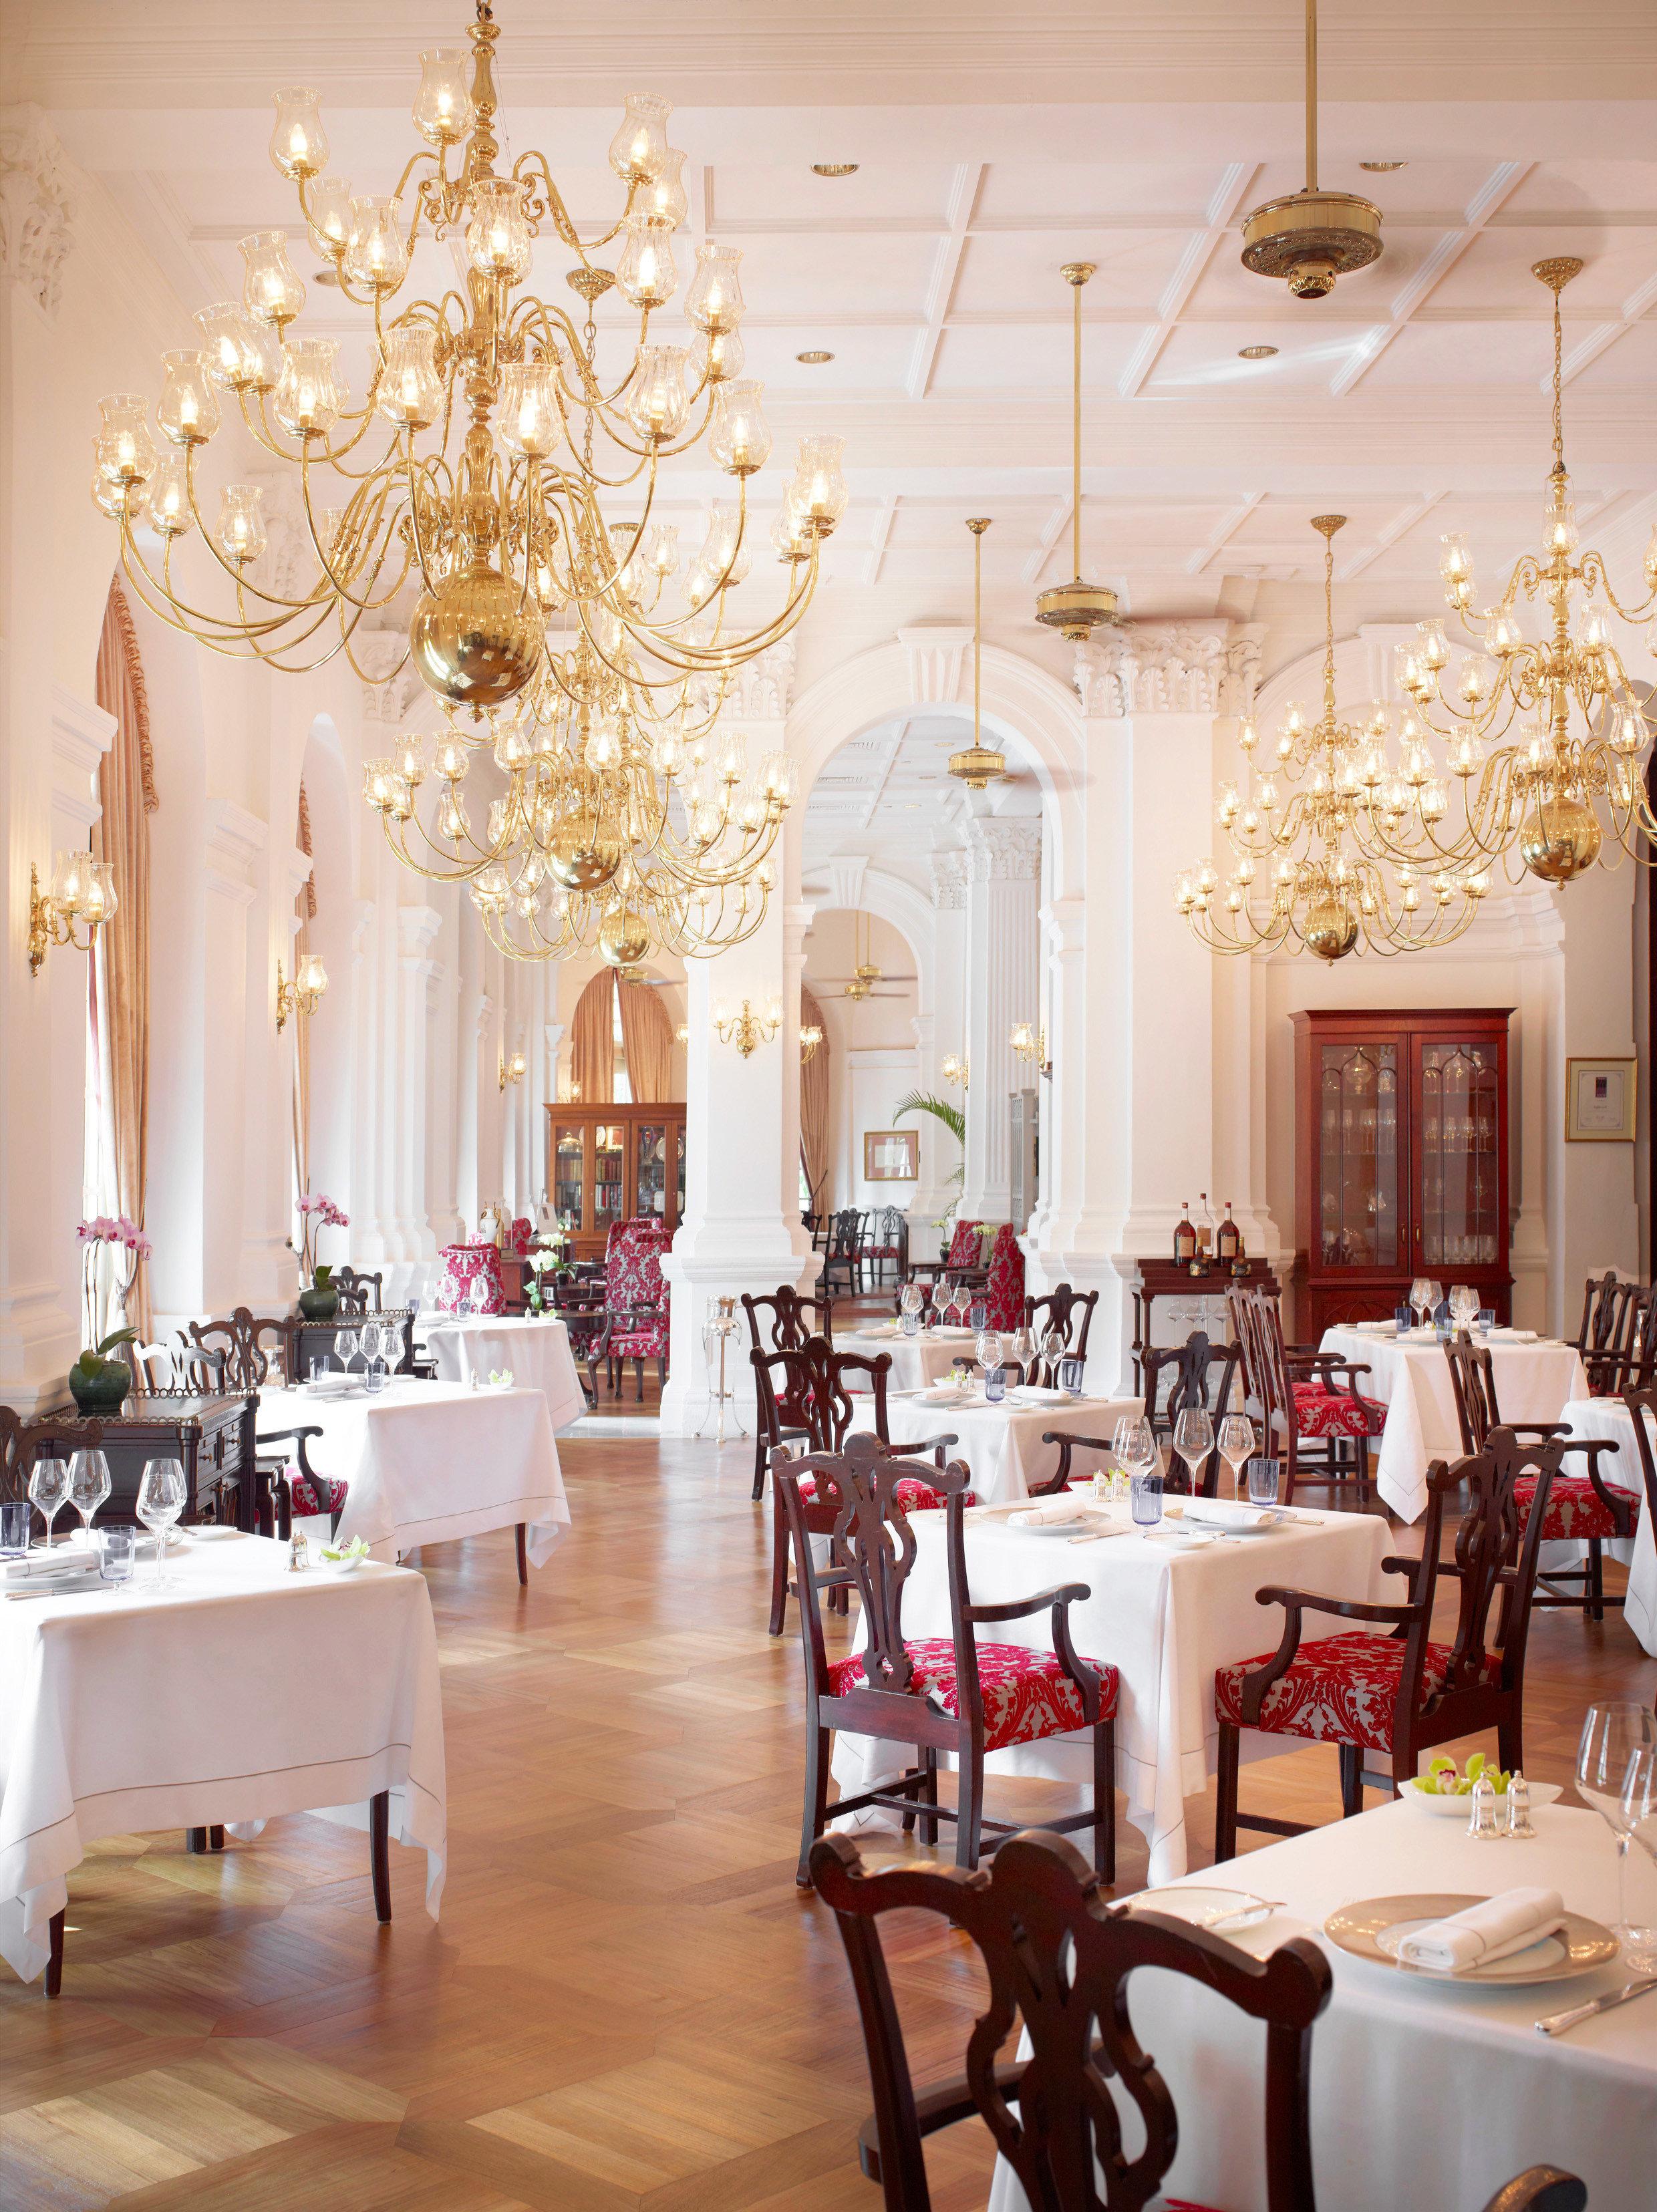 Bar Dining Drink Eat Elegant Luxury Romantic function hall ceremony lighting ballroom restaurant centrepiece aisle dining table